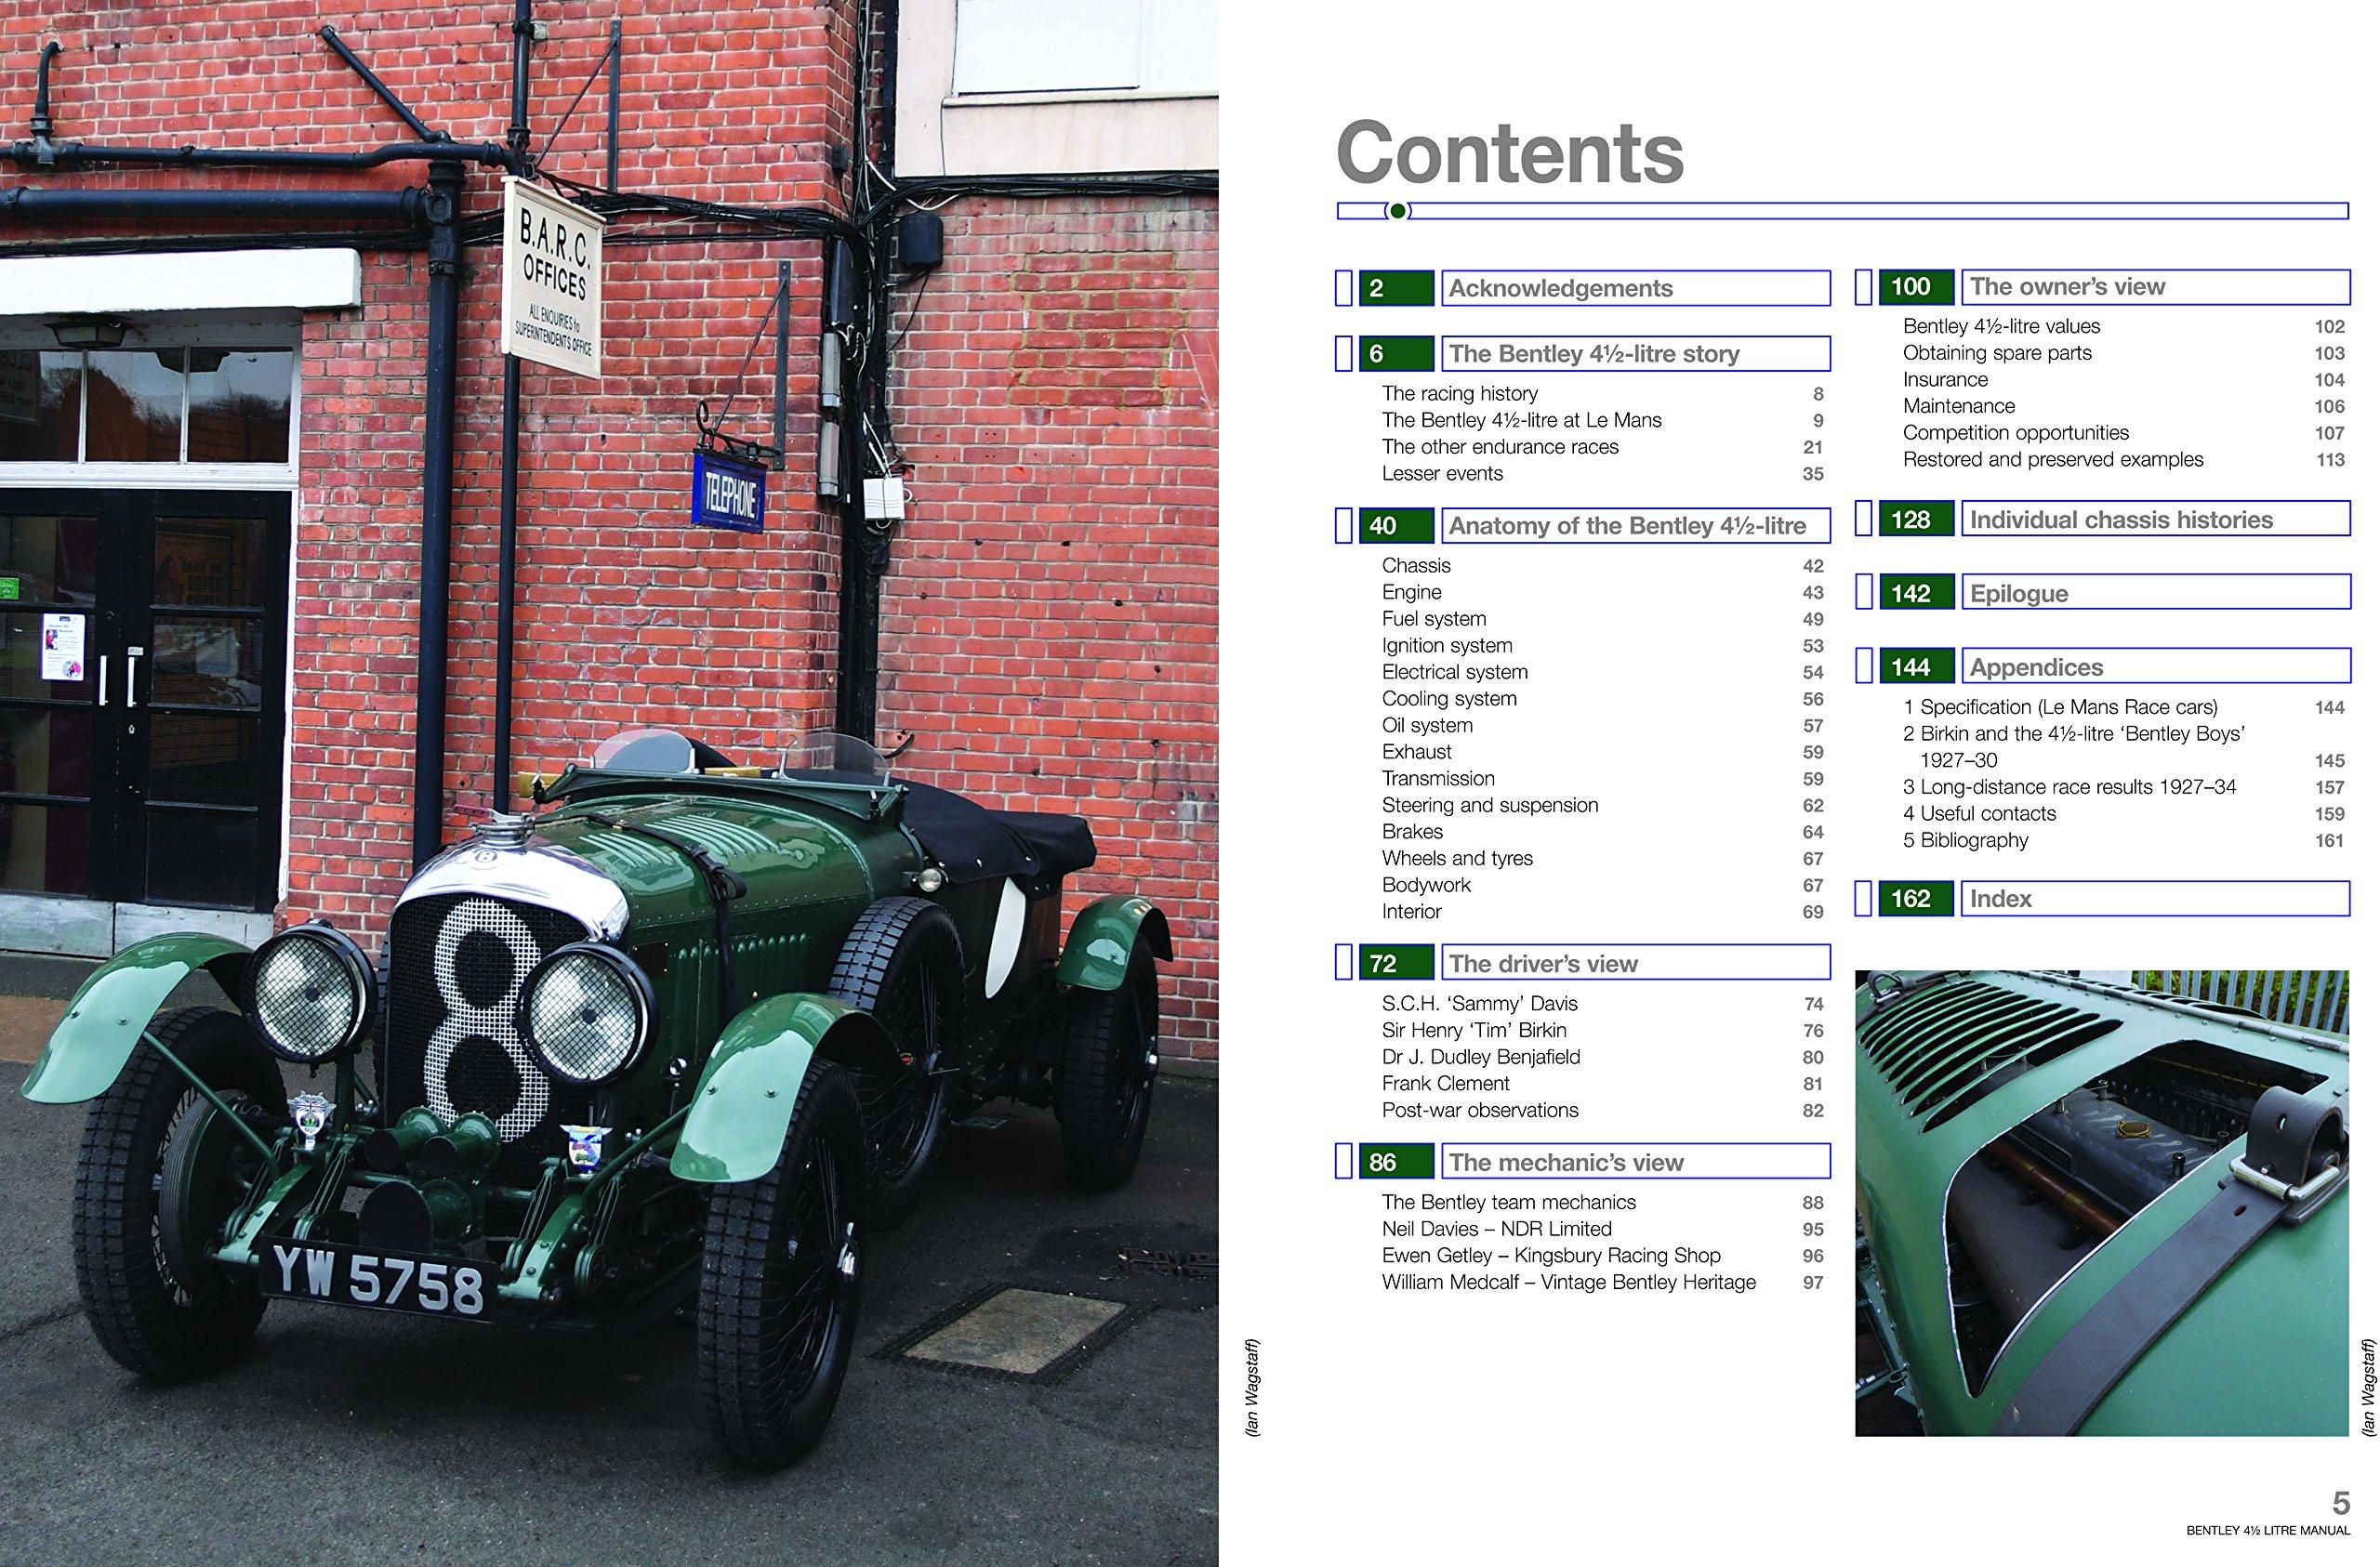 Bentley 4 1 2 Litre Owners Workshop Manual 1927 onwards all